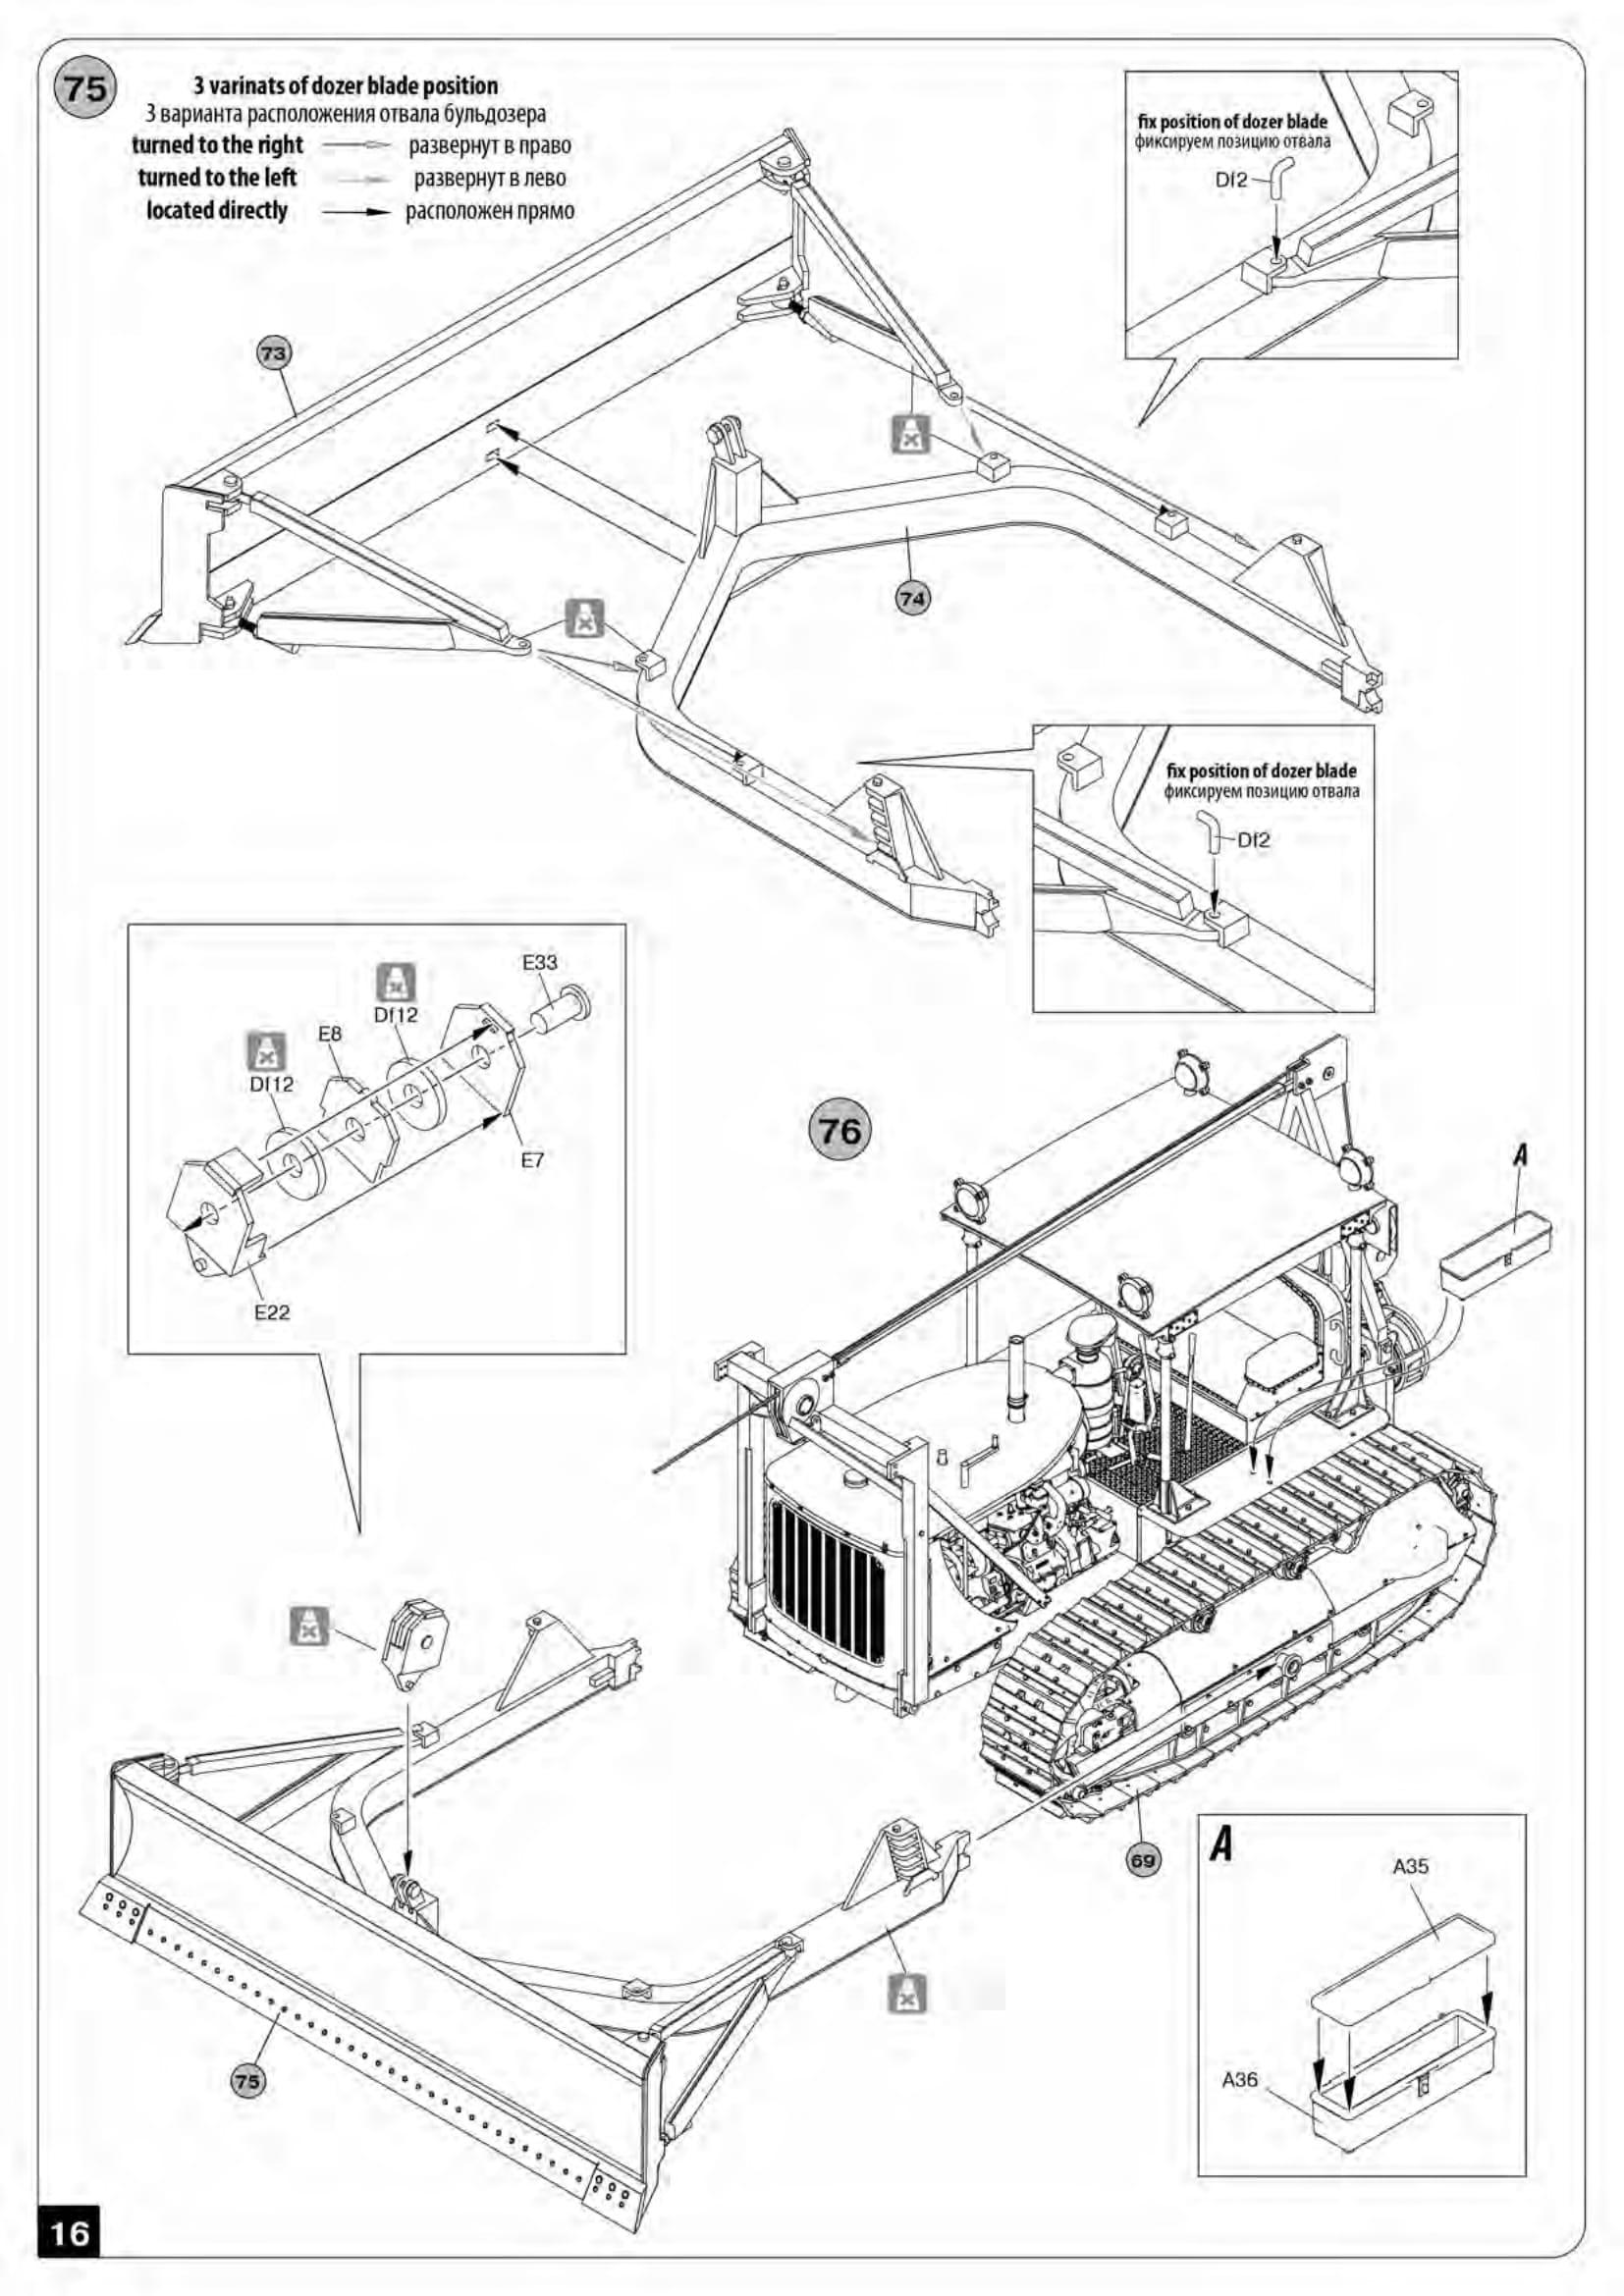 Kjhg International Fuse Box Panel Diagram Get